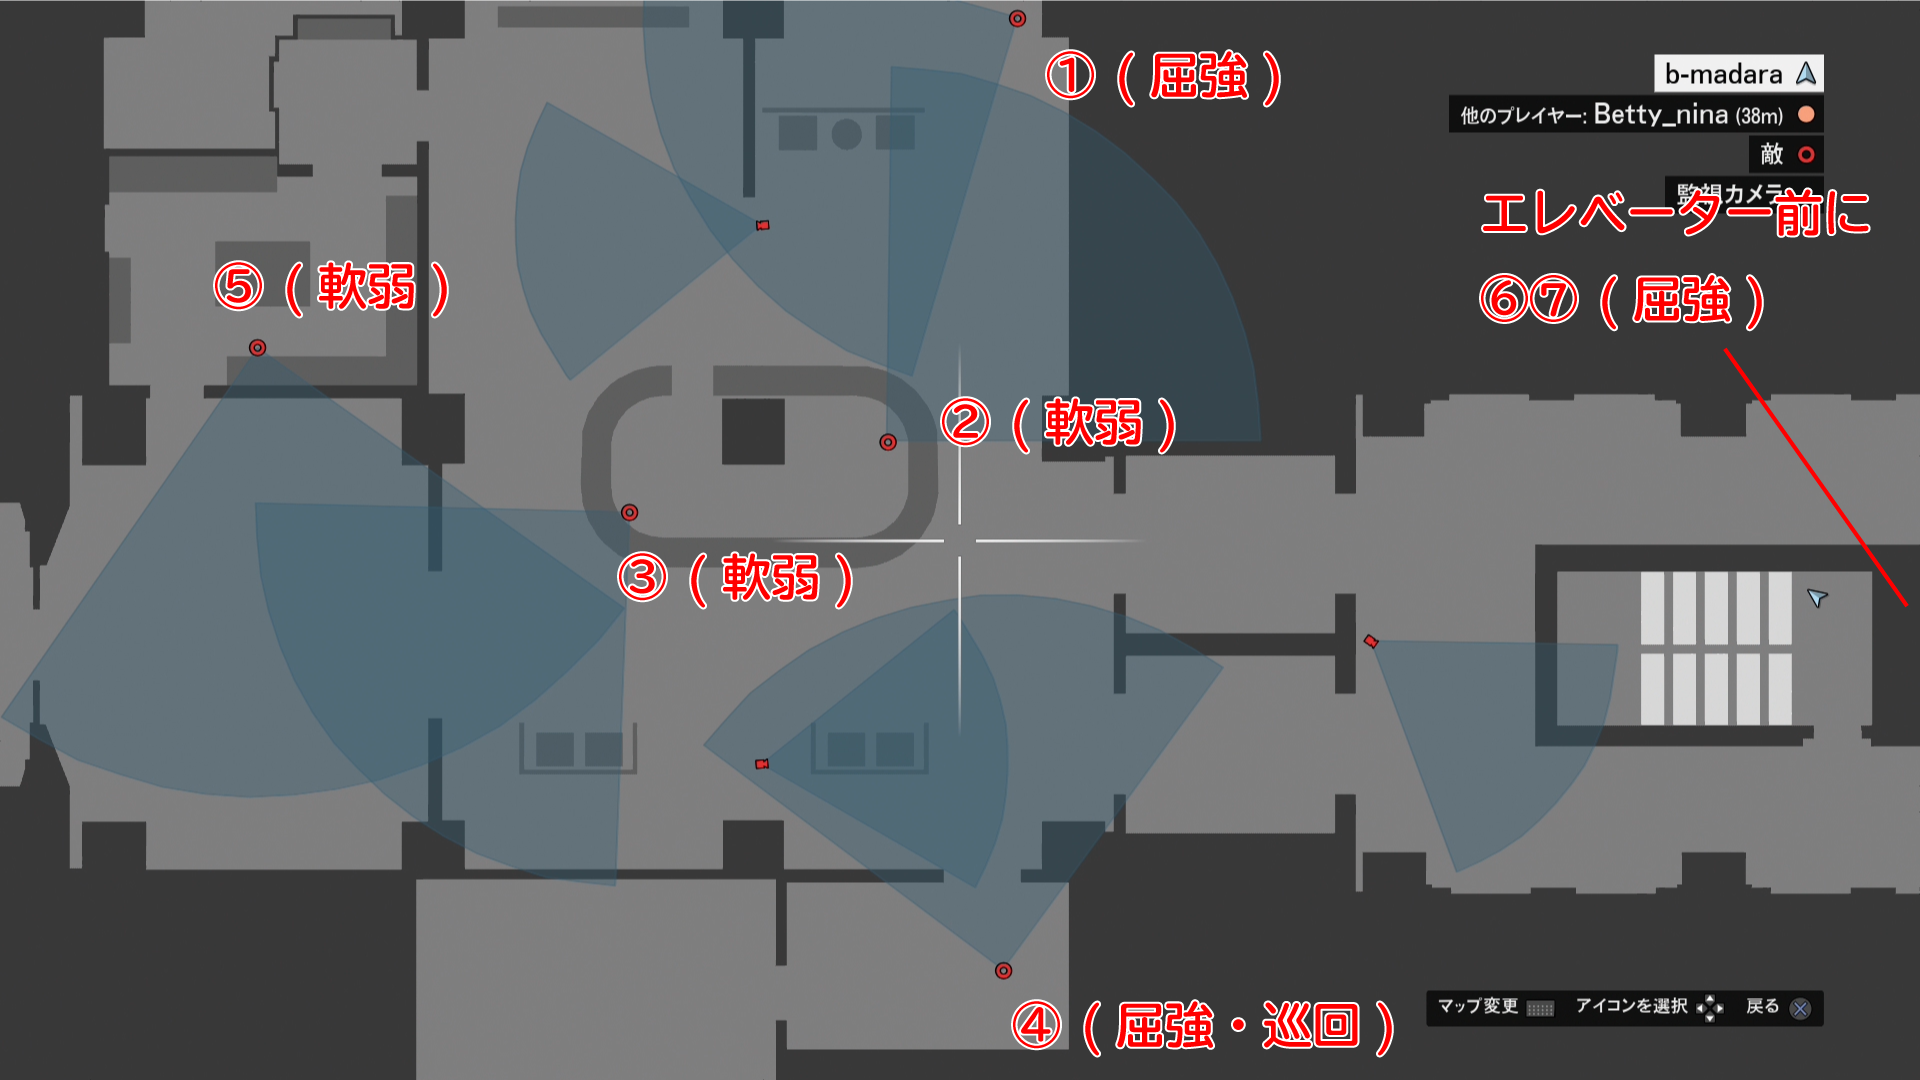 GTA5カジノ強盗敵(隠密行動)の金庫室フロアの敵の配置